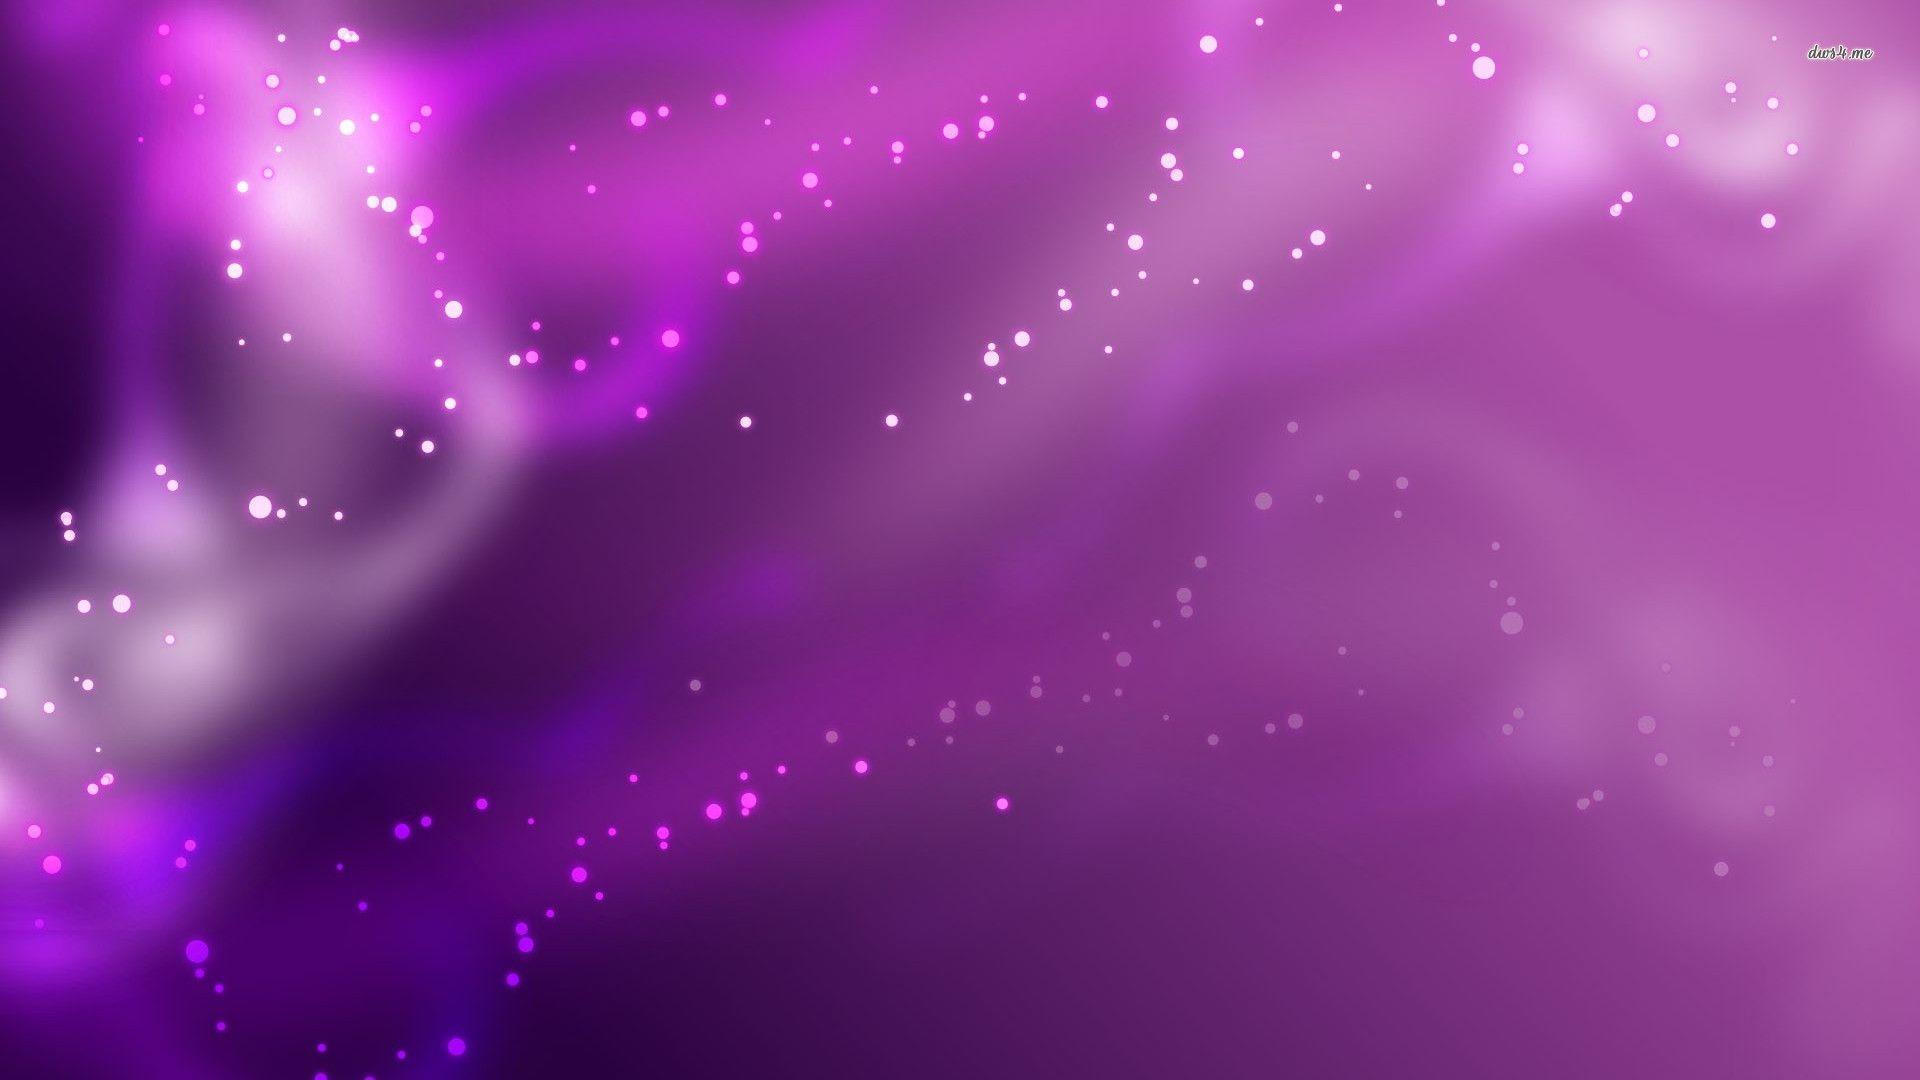 Light Purple Abstract Wallpaper Background 1 HD Wallpapers   aduphoto.